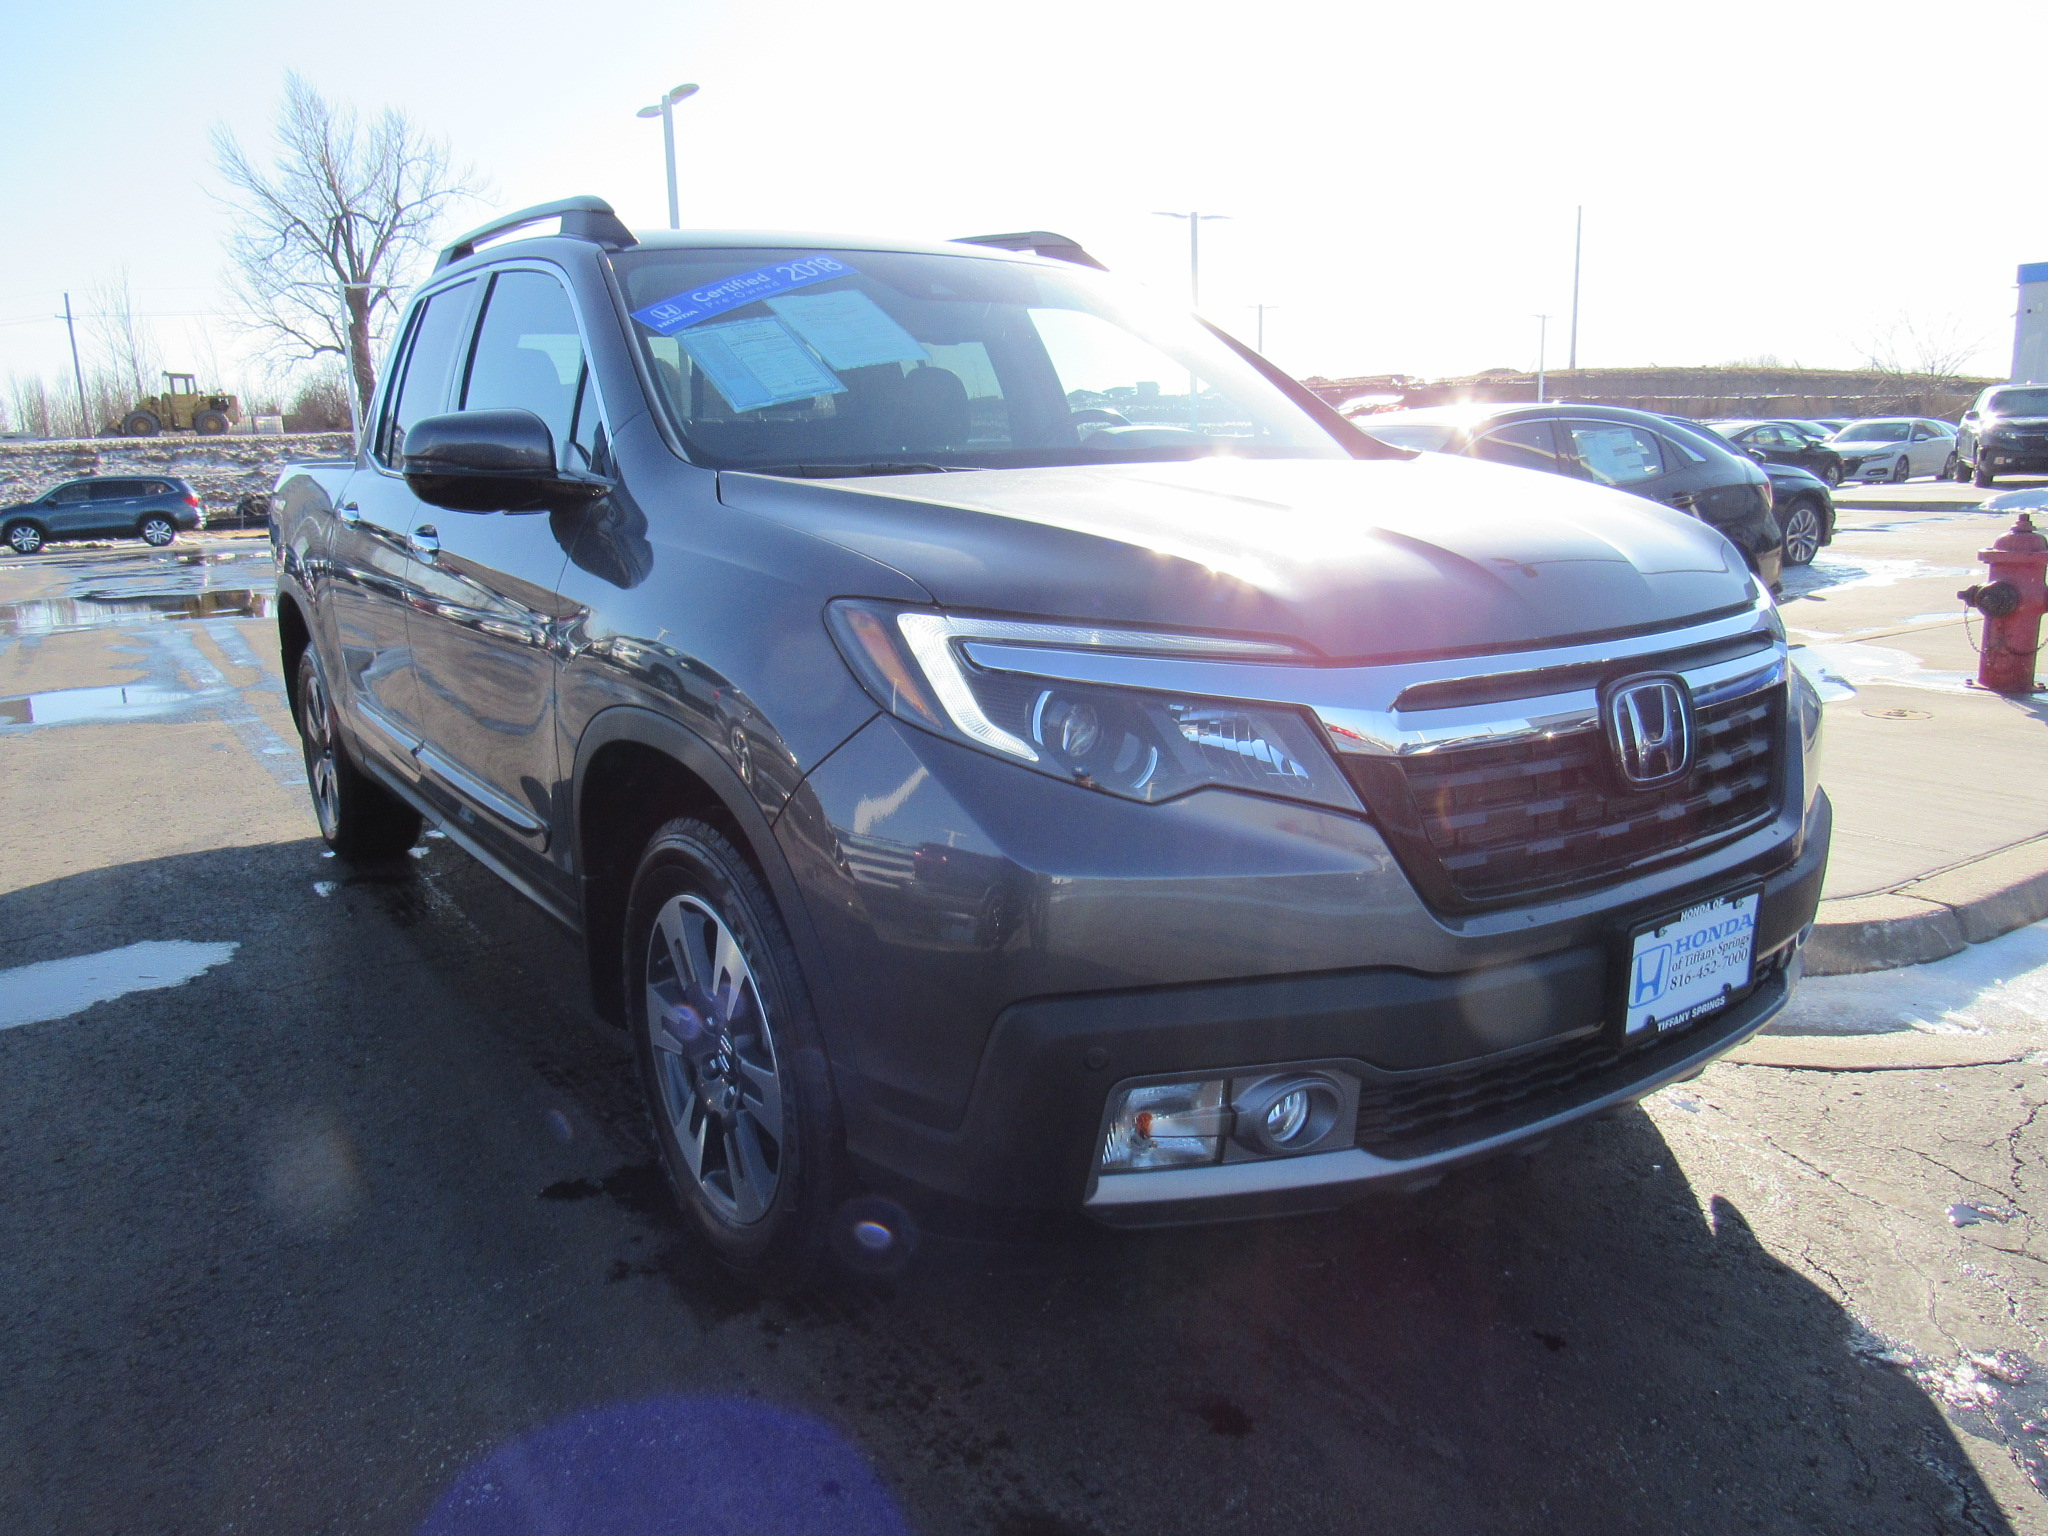 Certified 2018 Honda Ridgeline RTL-E AWD - Honda of Tiffany Springs - Kansas City MO